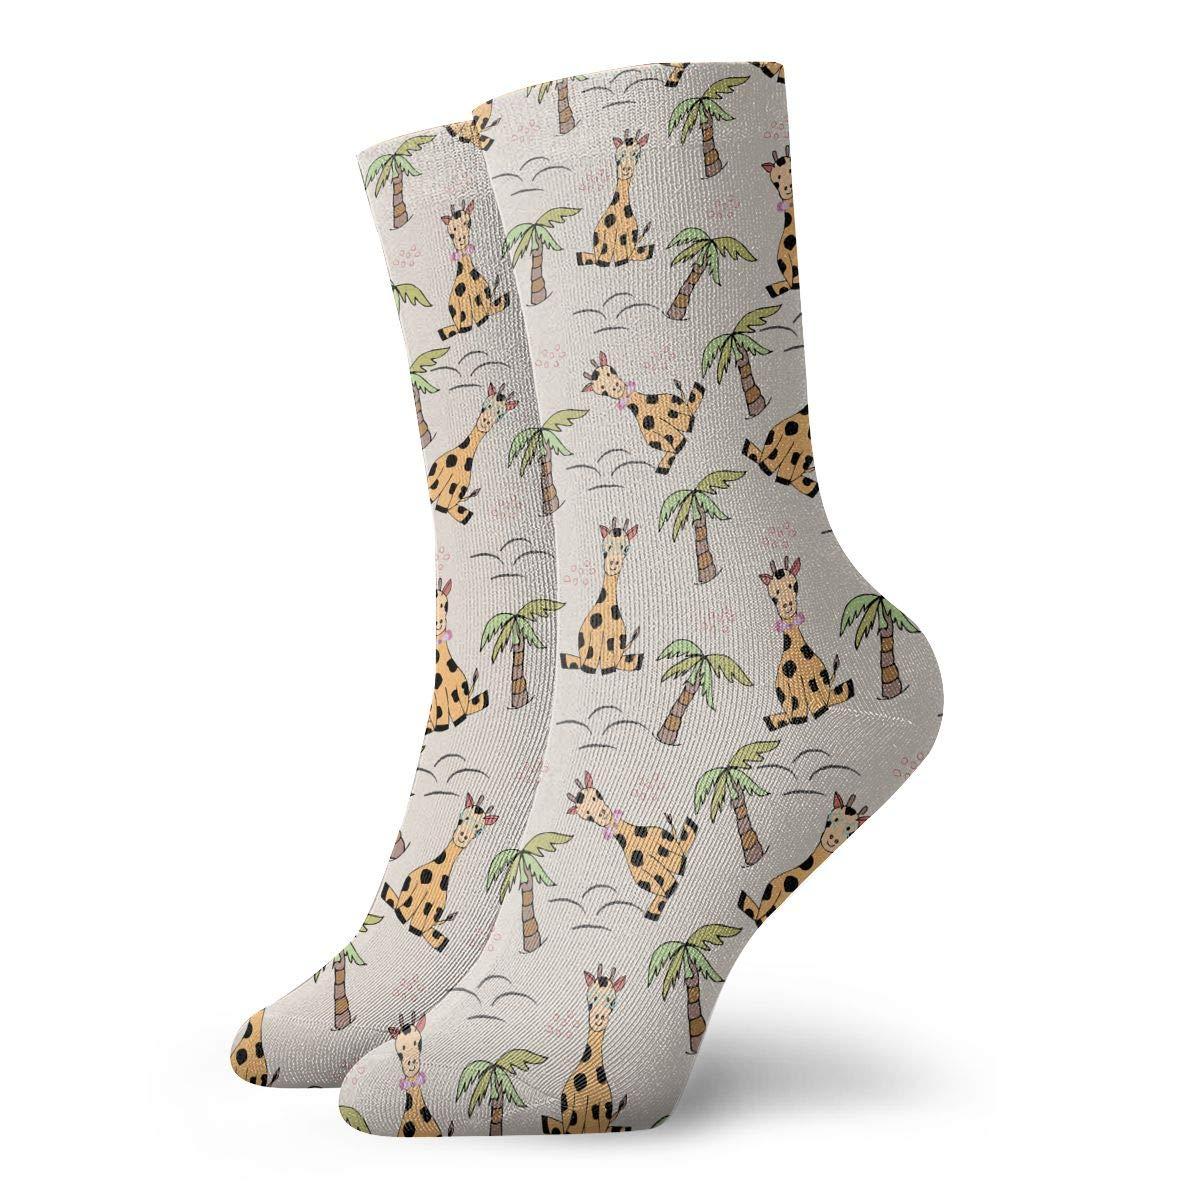 Unisex Giraffe And Coconut Tree Athletic Quarter Ankle Print Breathable Hiking Running Socks